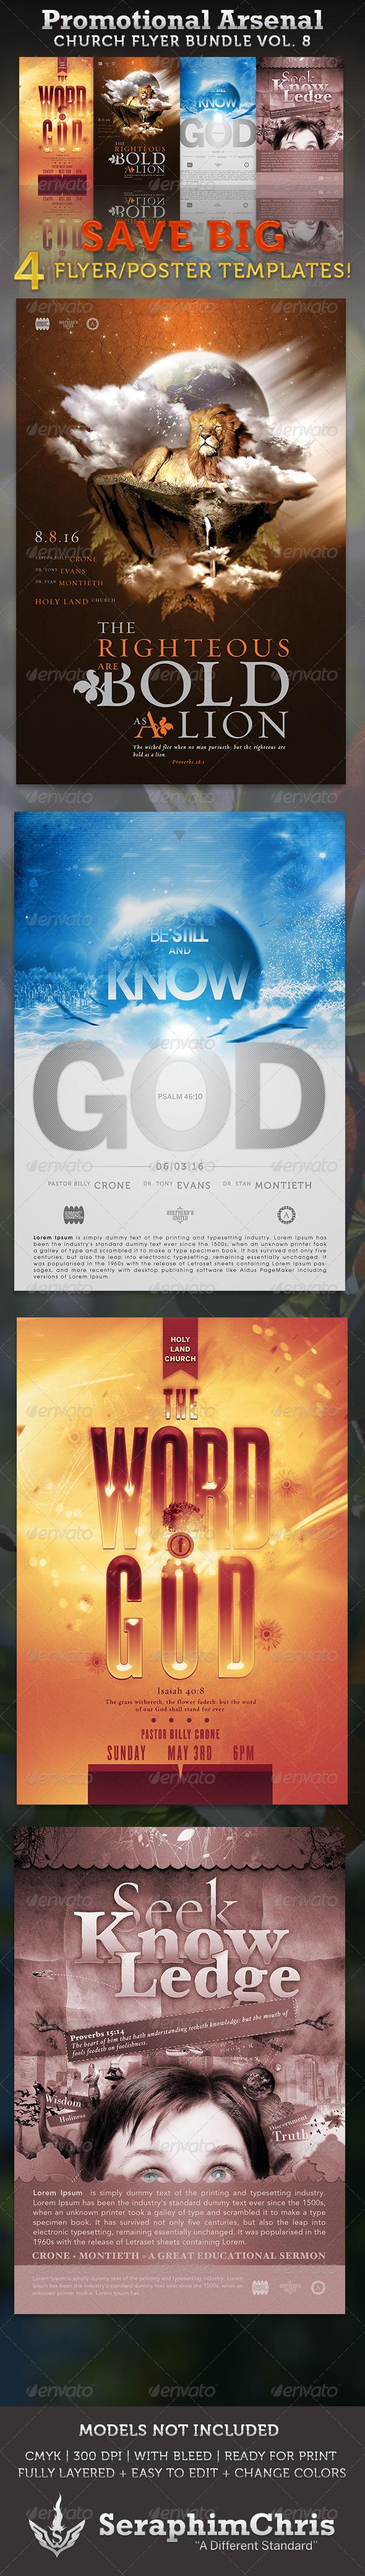 GraphicRiver Promotional Arsenal Church Flyer Bundle 8 3305131